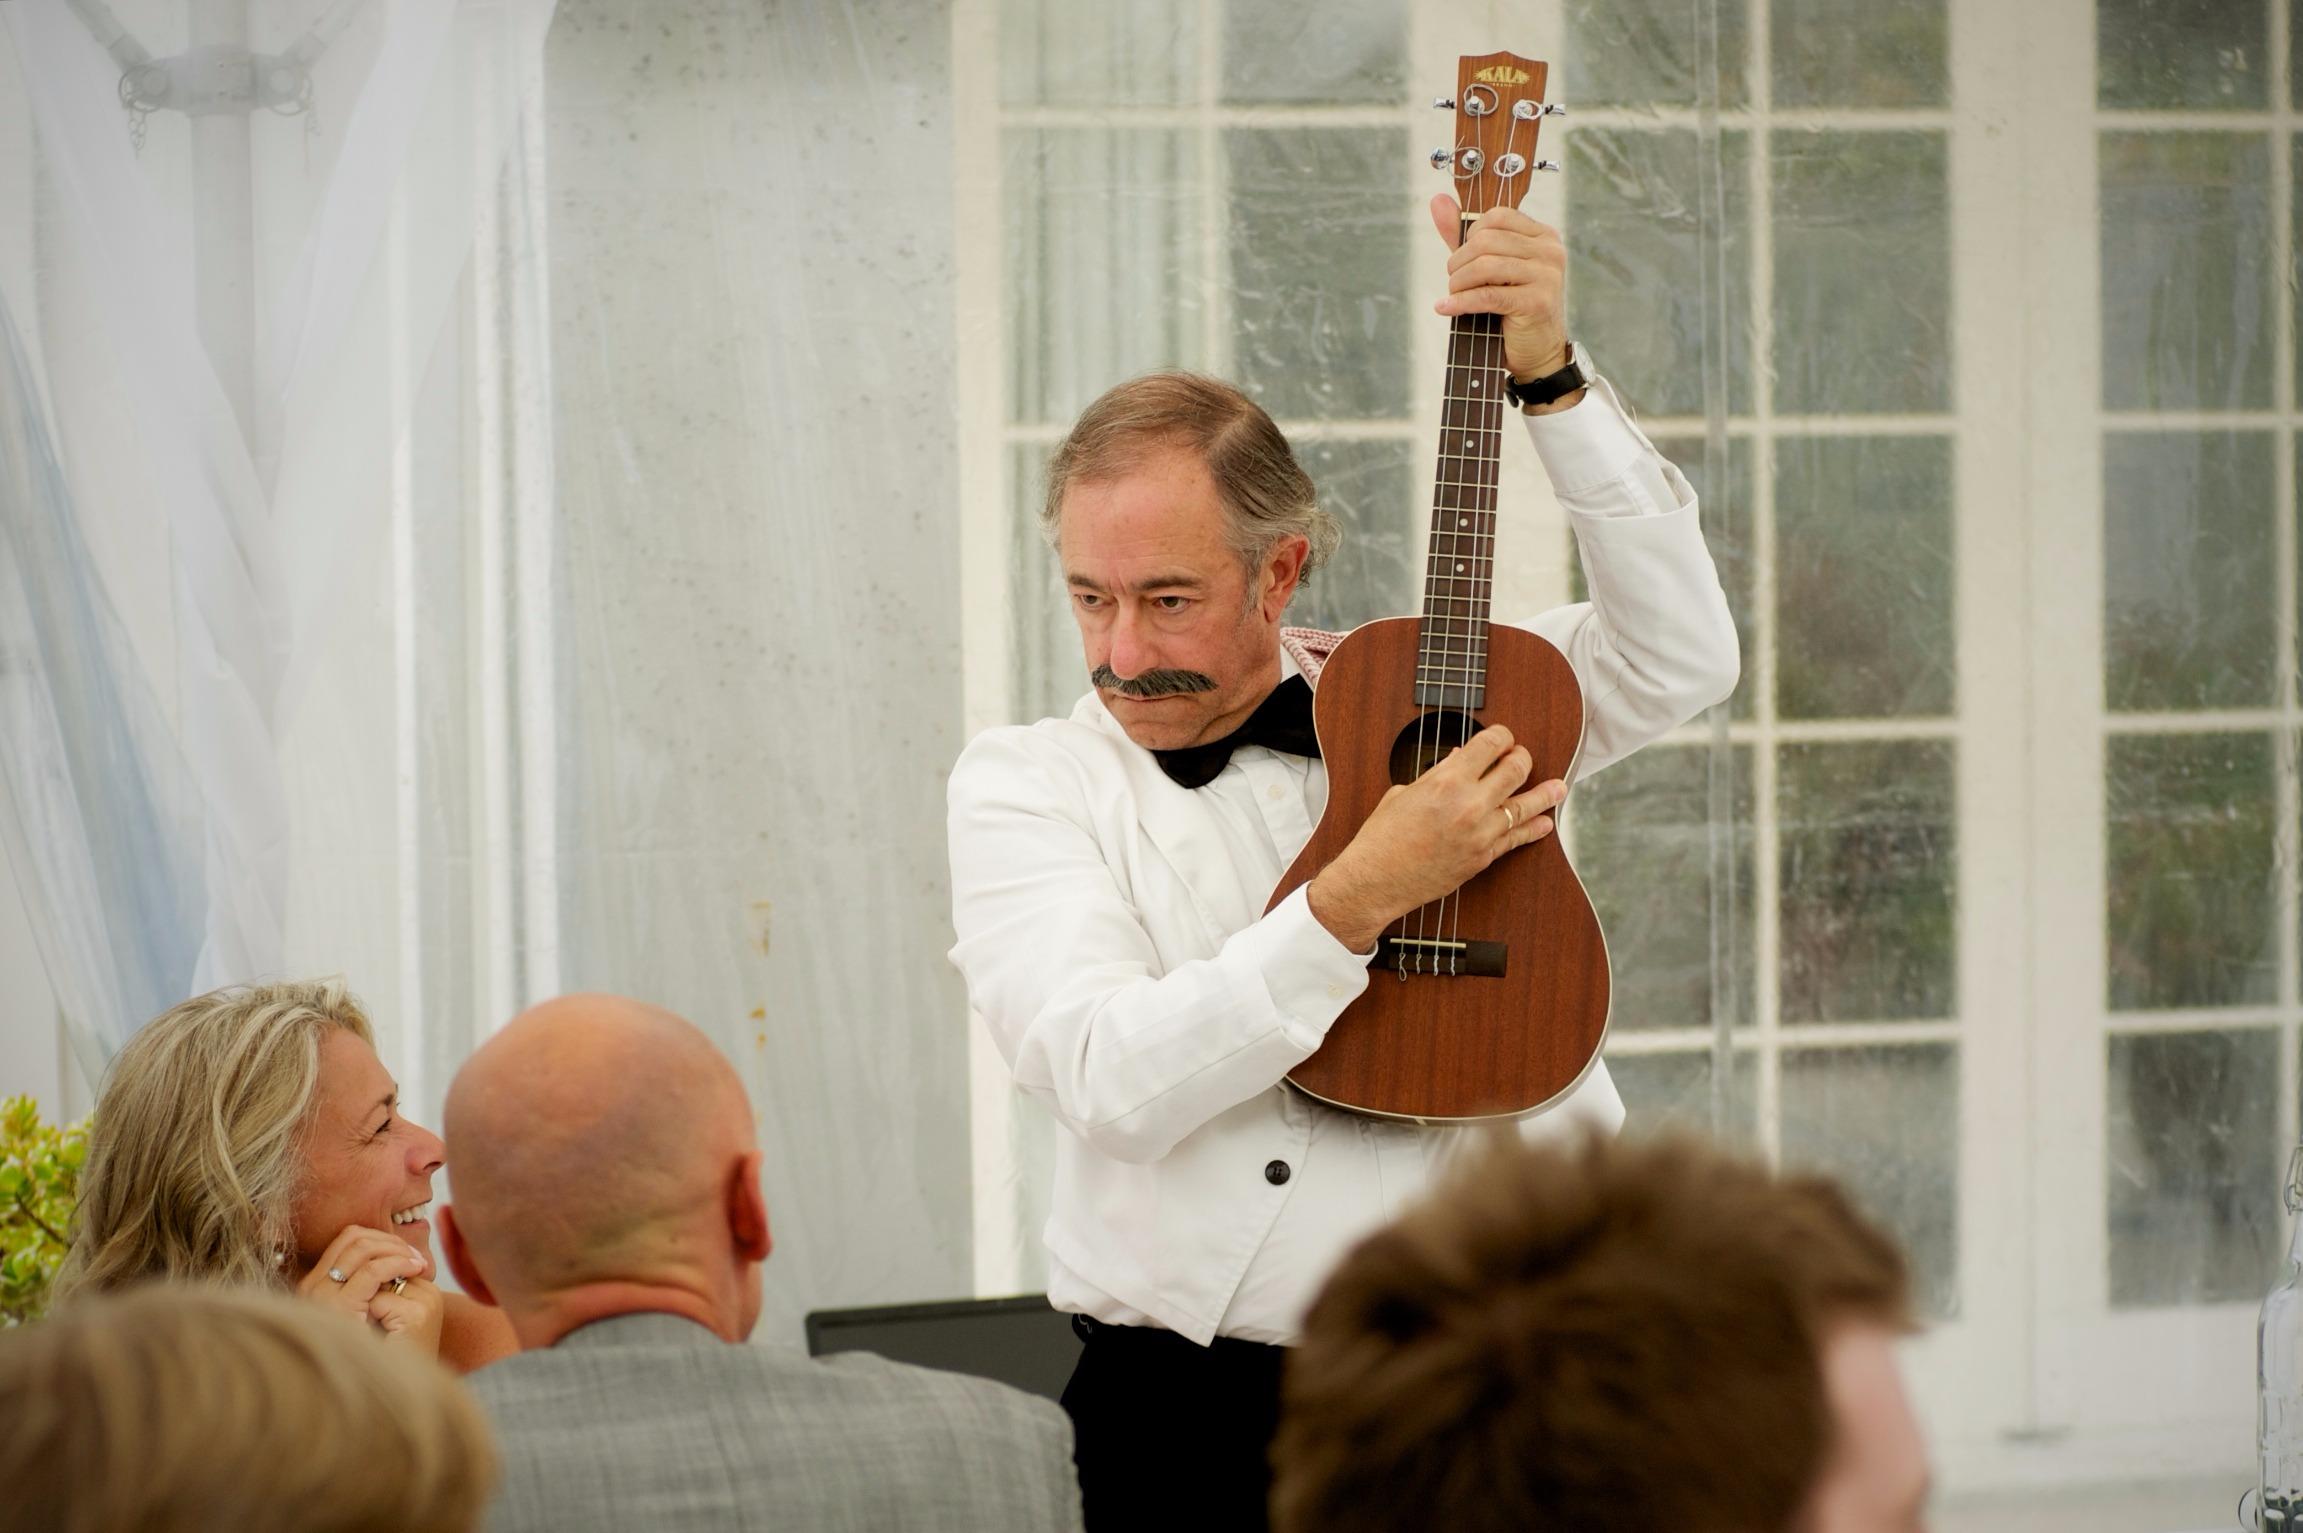 Manuel serenading guests...